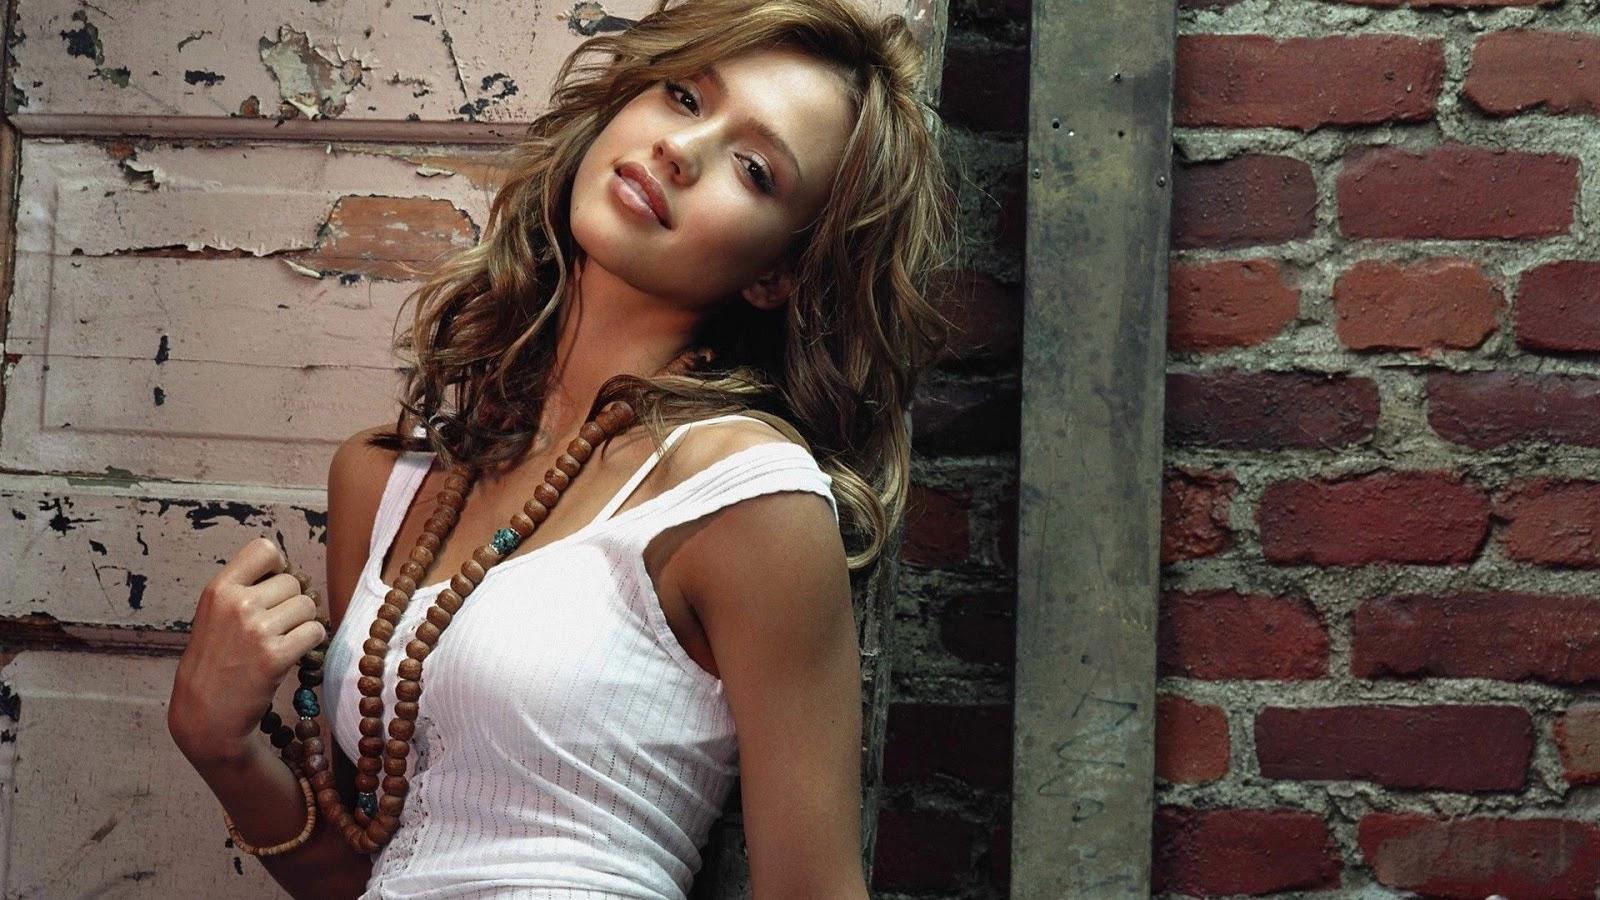 Celebrity Arena: Jessica Alba Hot Sexy Photo & Short Biography